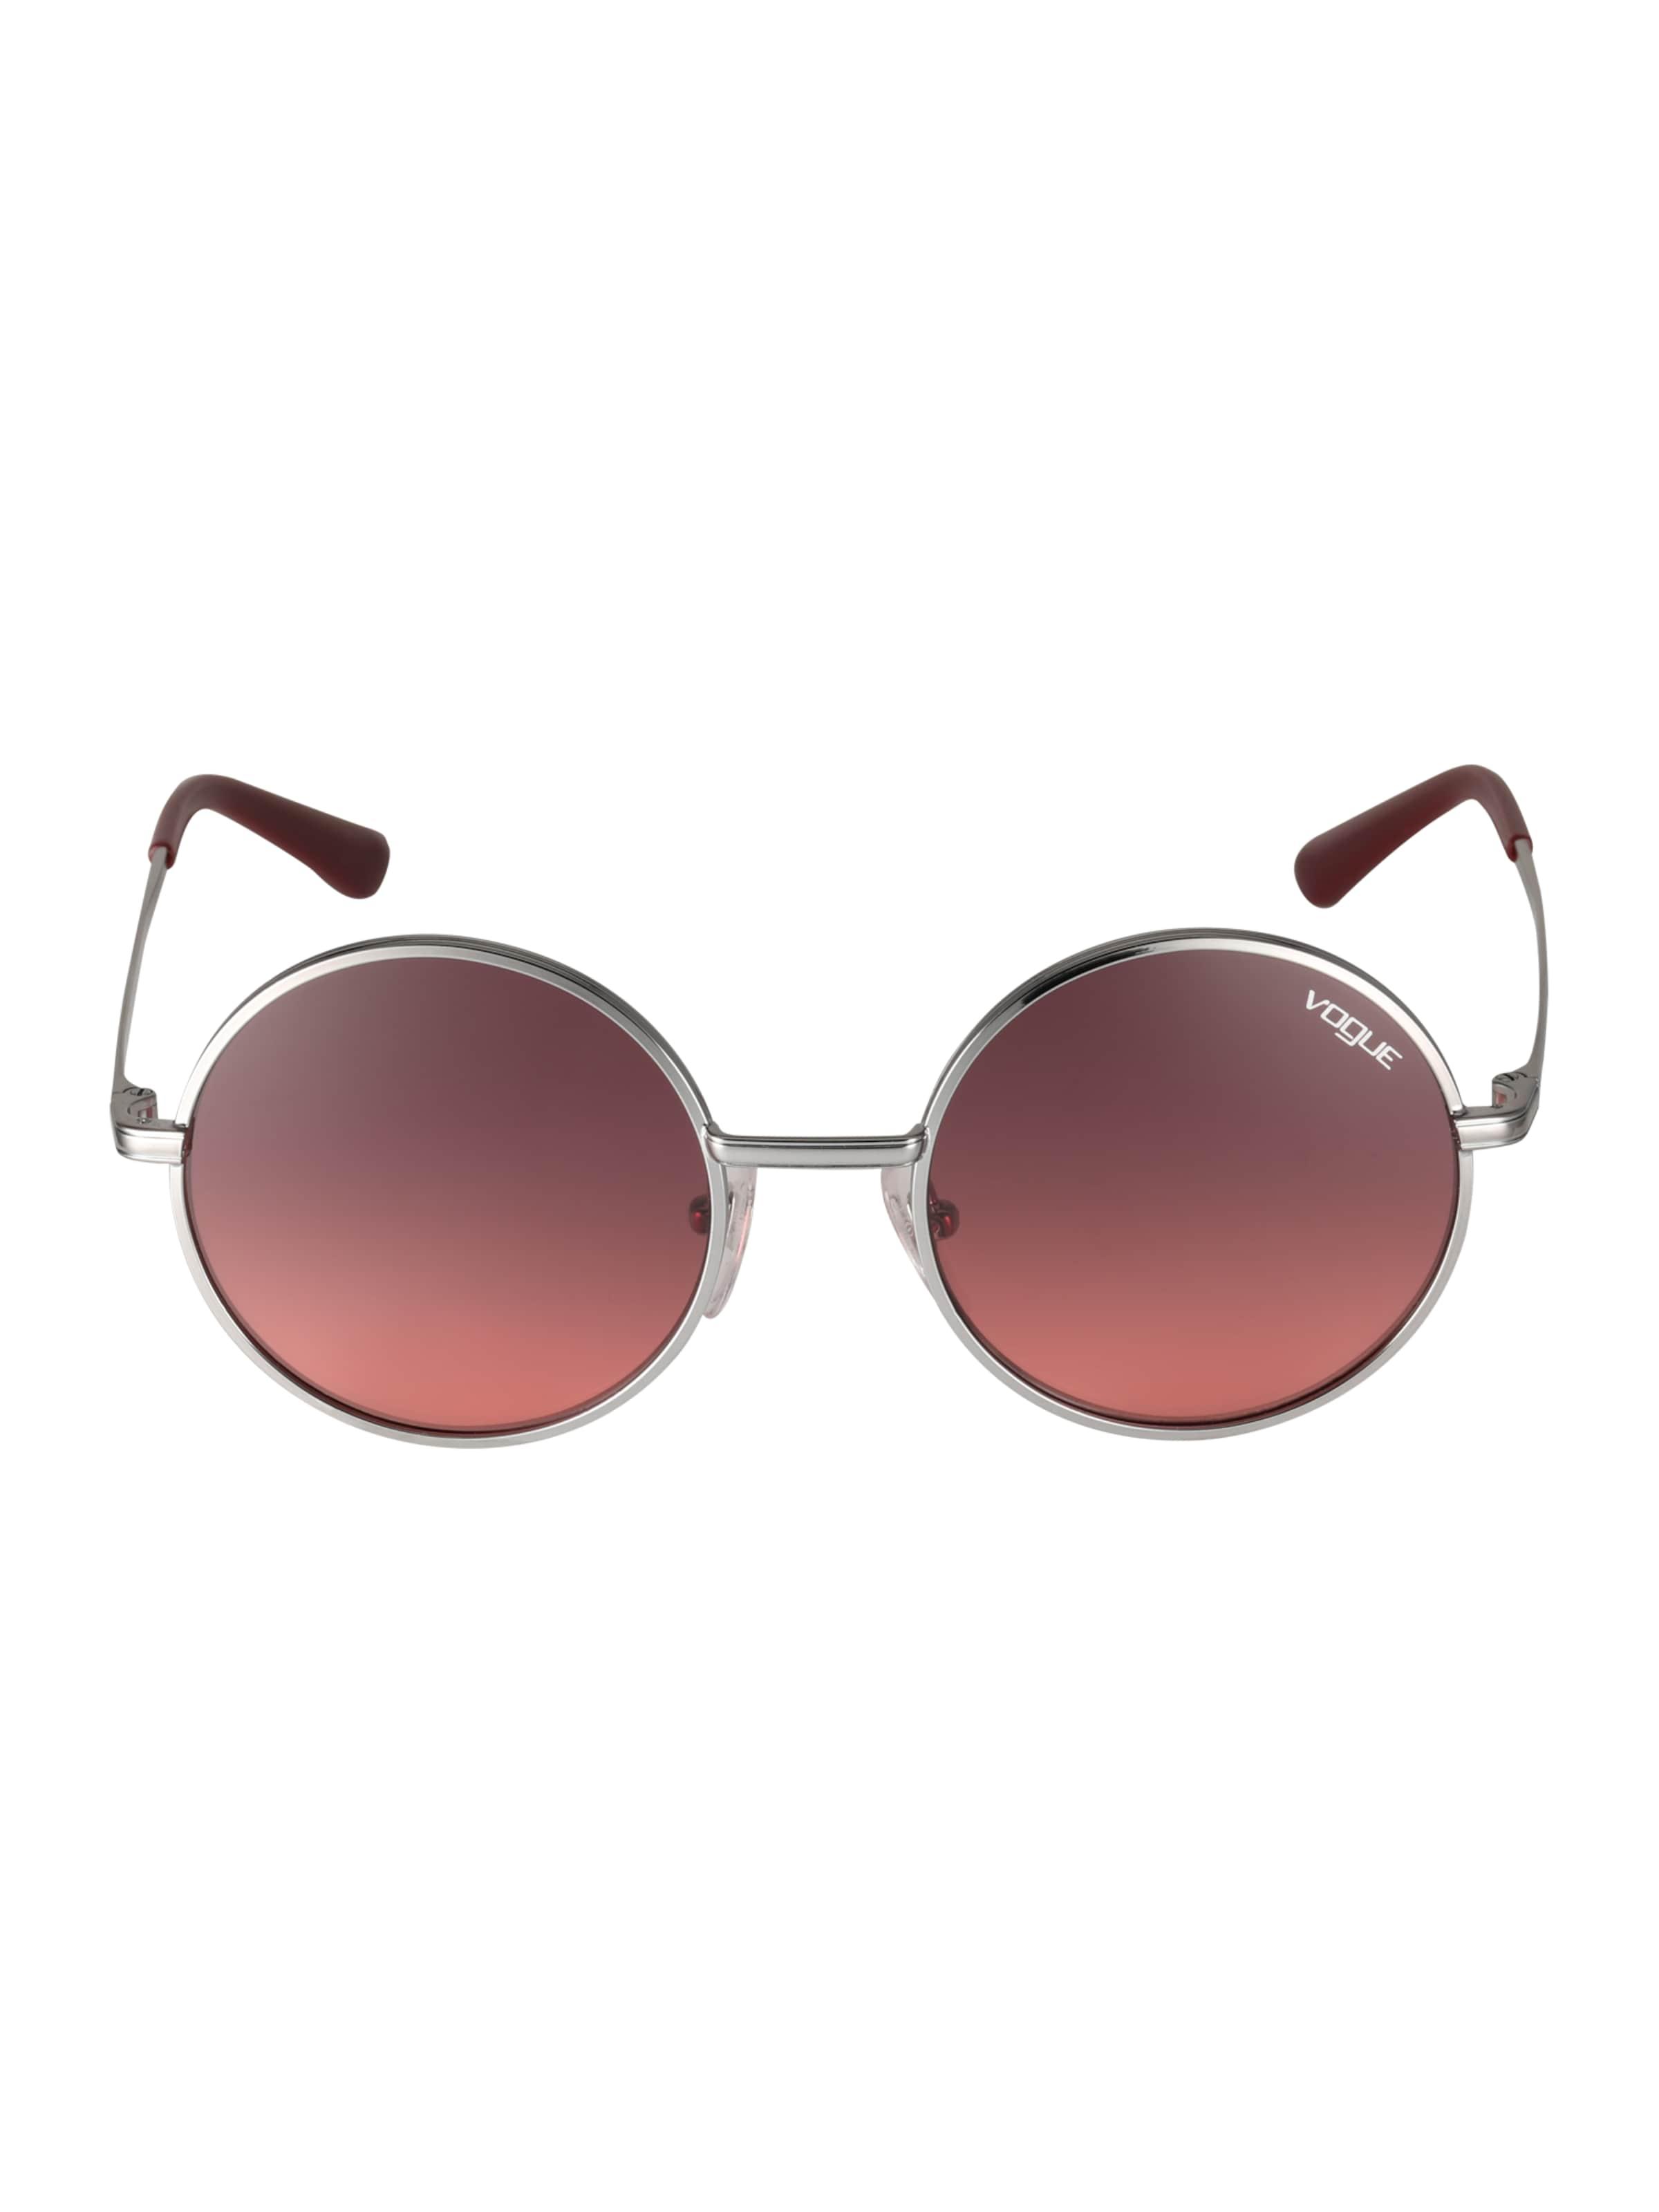 En De Lunettes Eyewear Vogue Soleil MarronOr n8kwXOP0